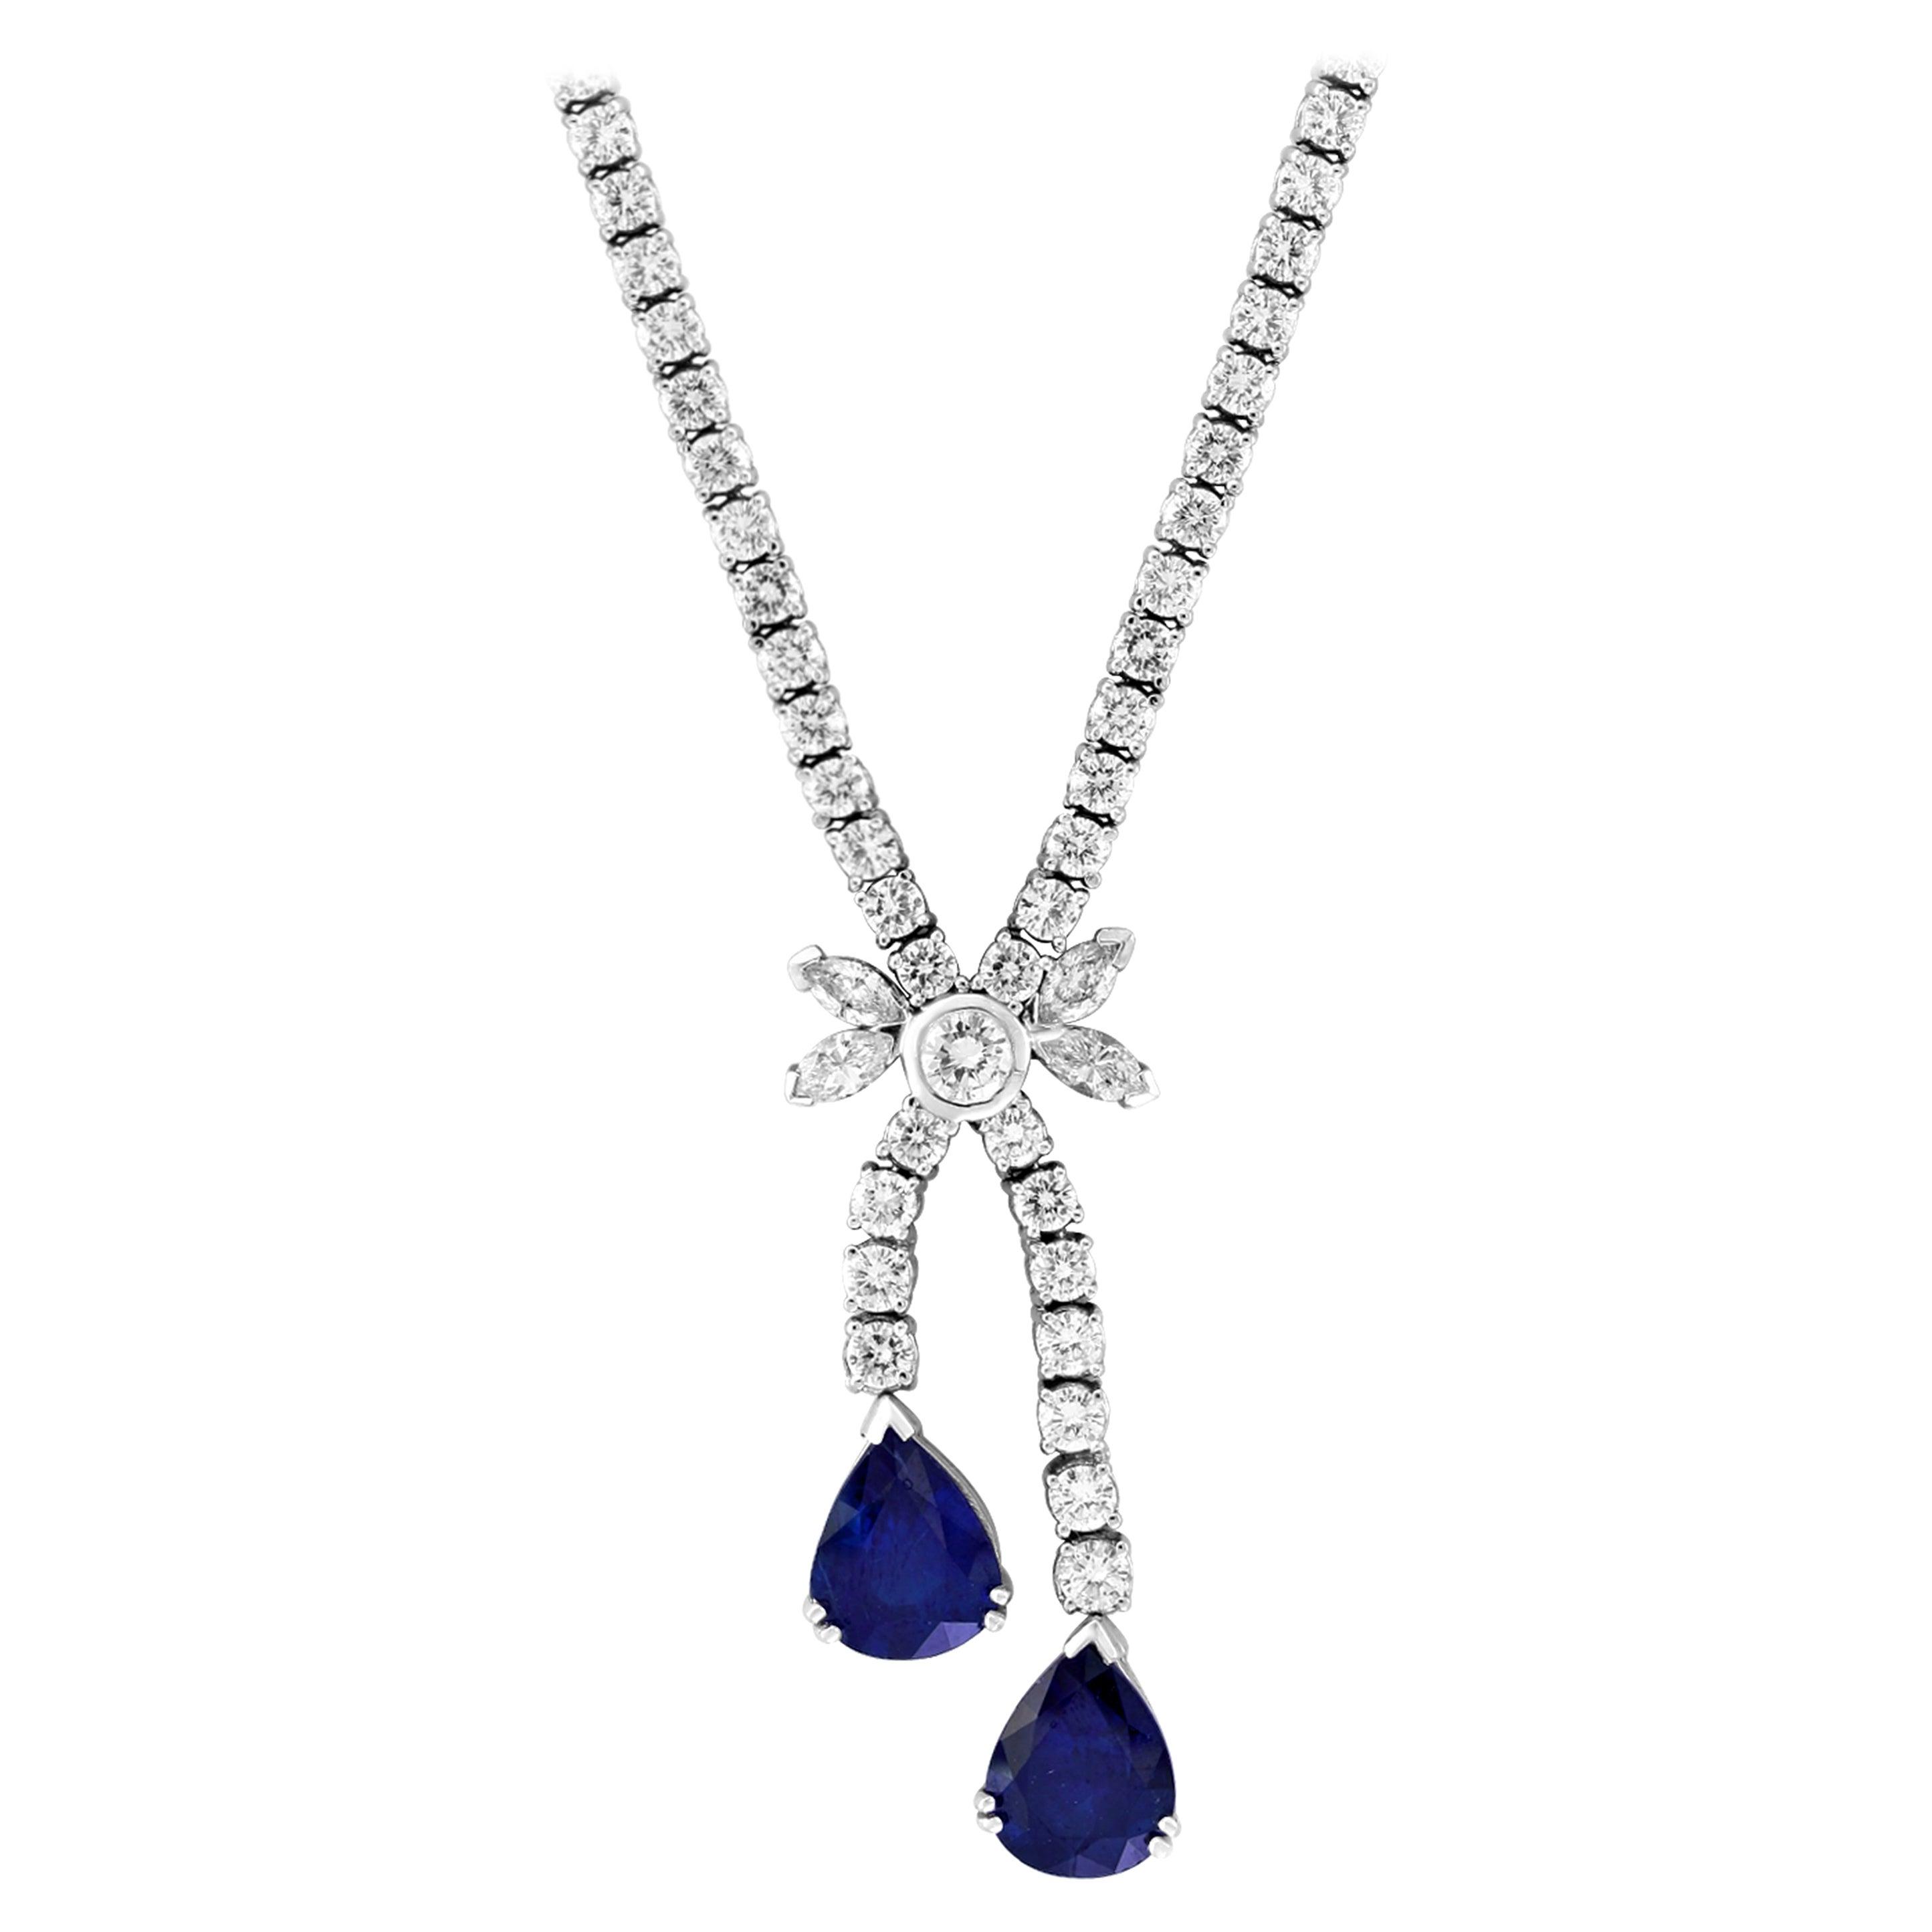 Natural Blue Sapphire and Diamond Necklace 18 Karat White Gold, Estate